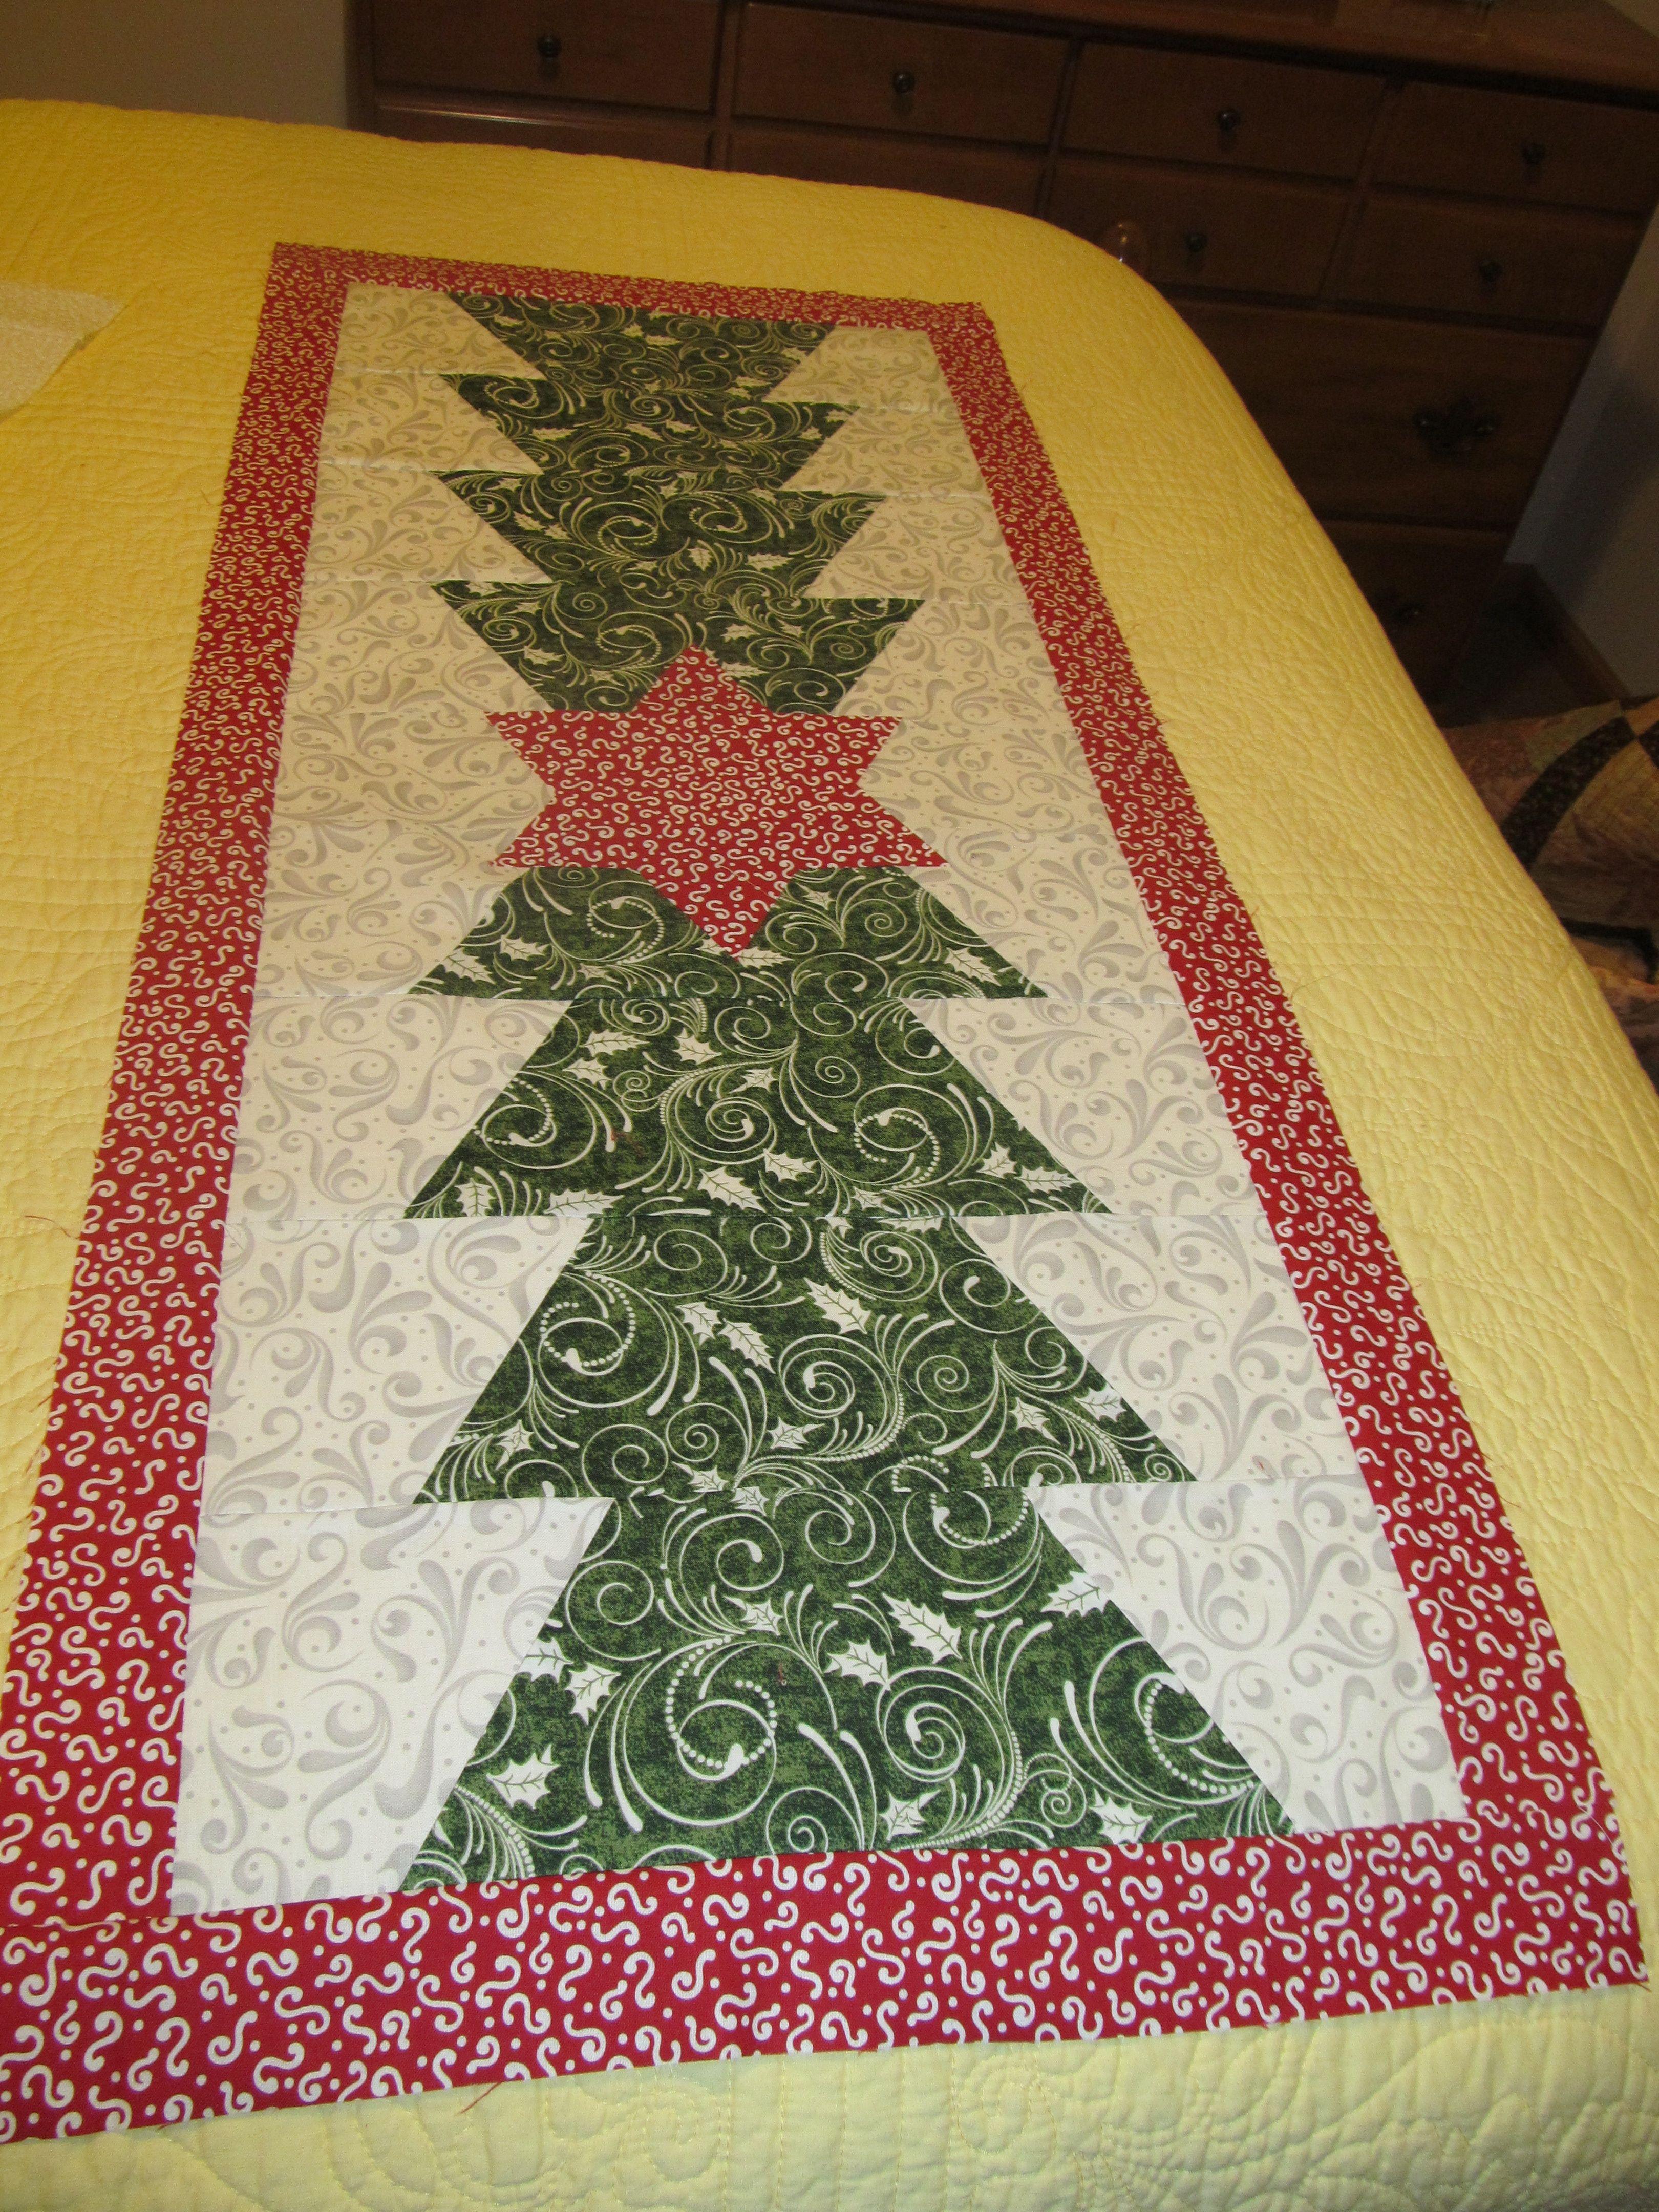 Christmas table runner my quilts pinterest quilt for Table runner quilt design